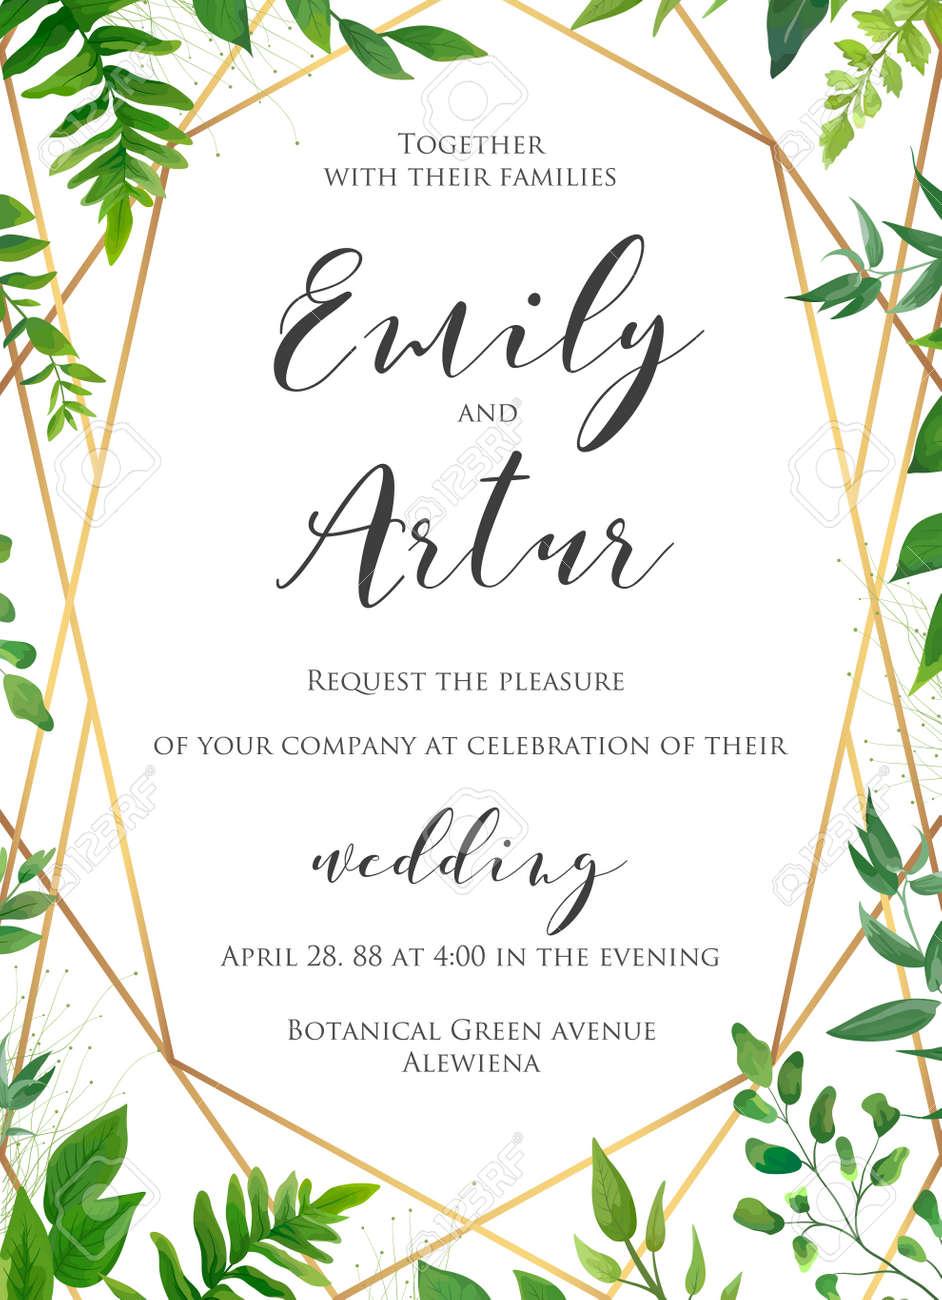 Natural Botanical Wedding Invitation, Invite, Save The Date Template ...